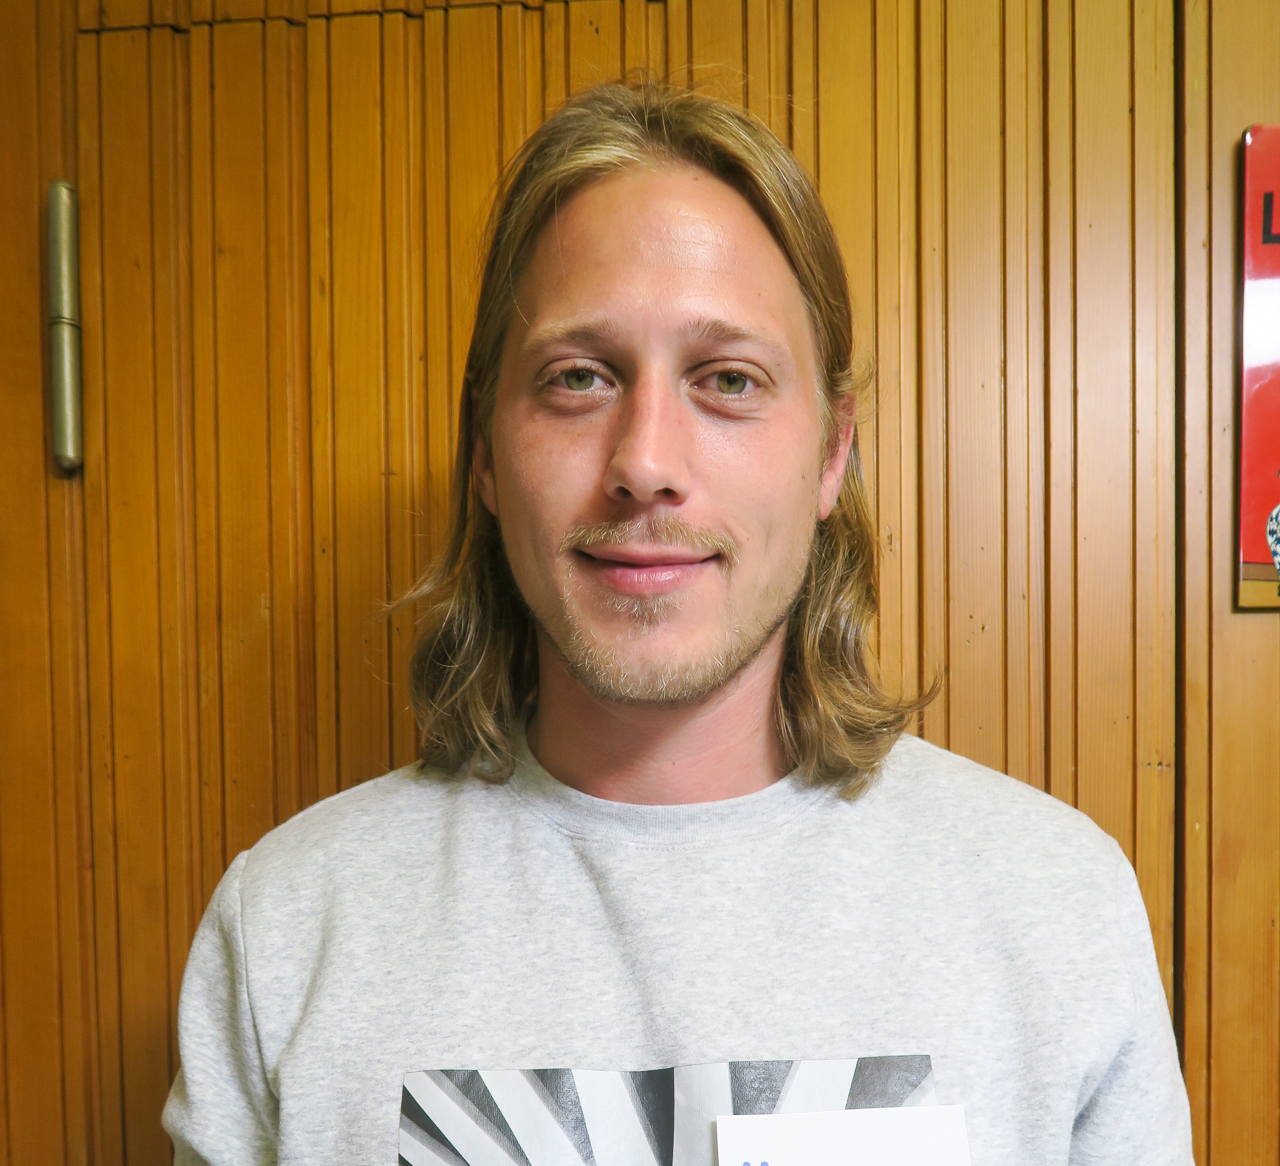 Marco Munter